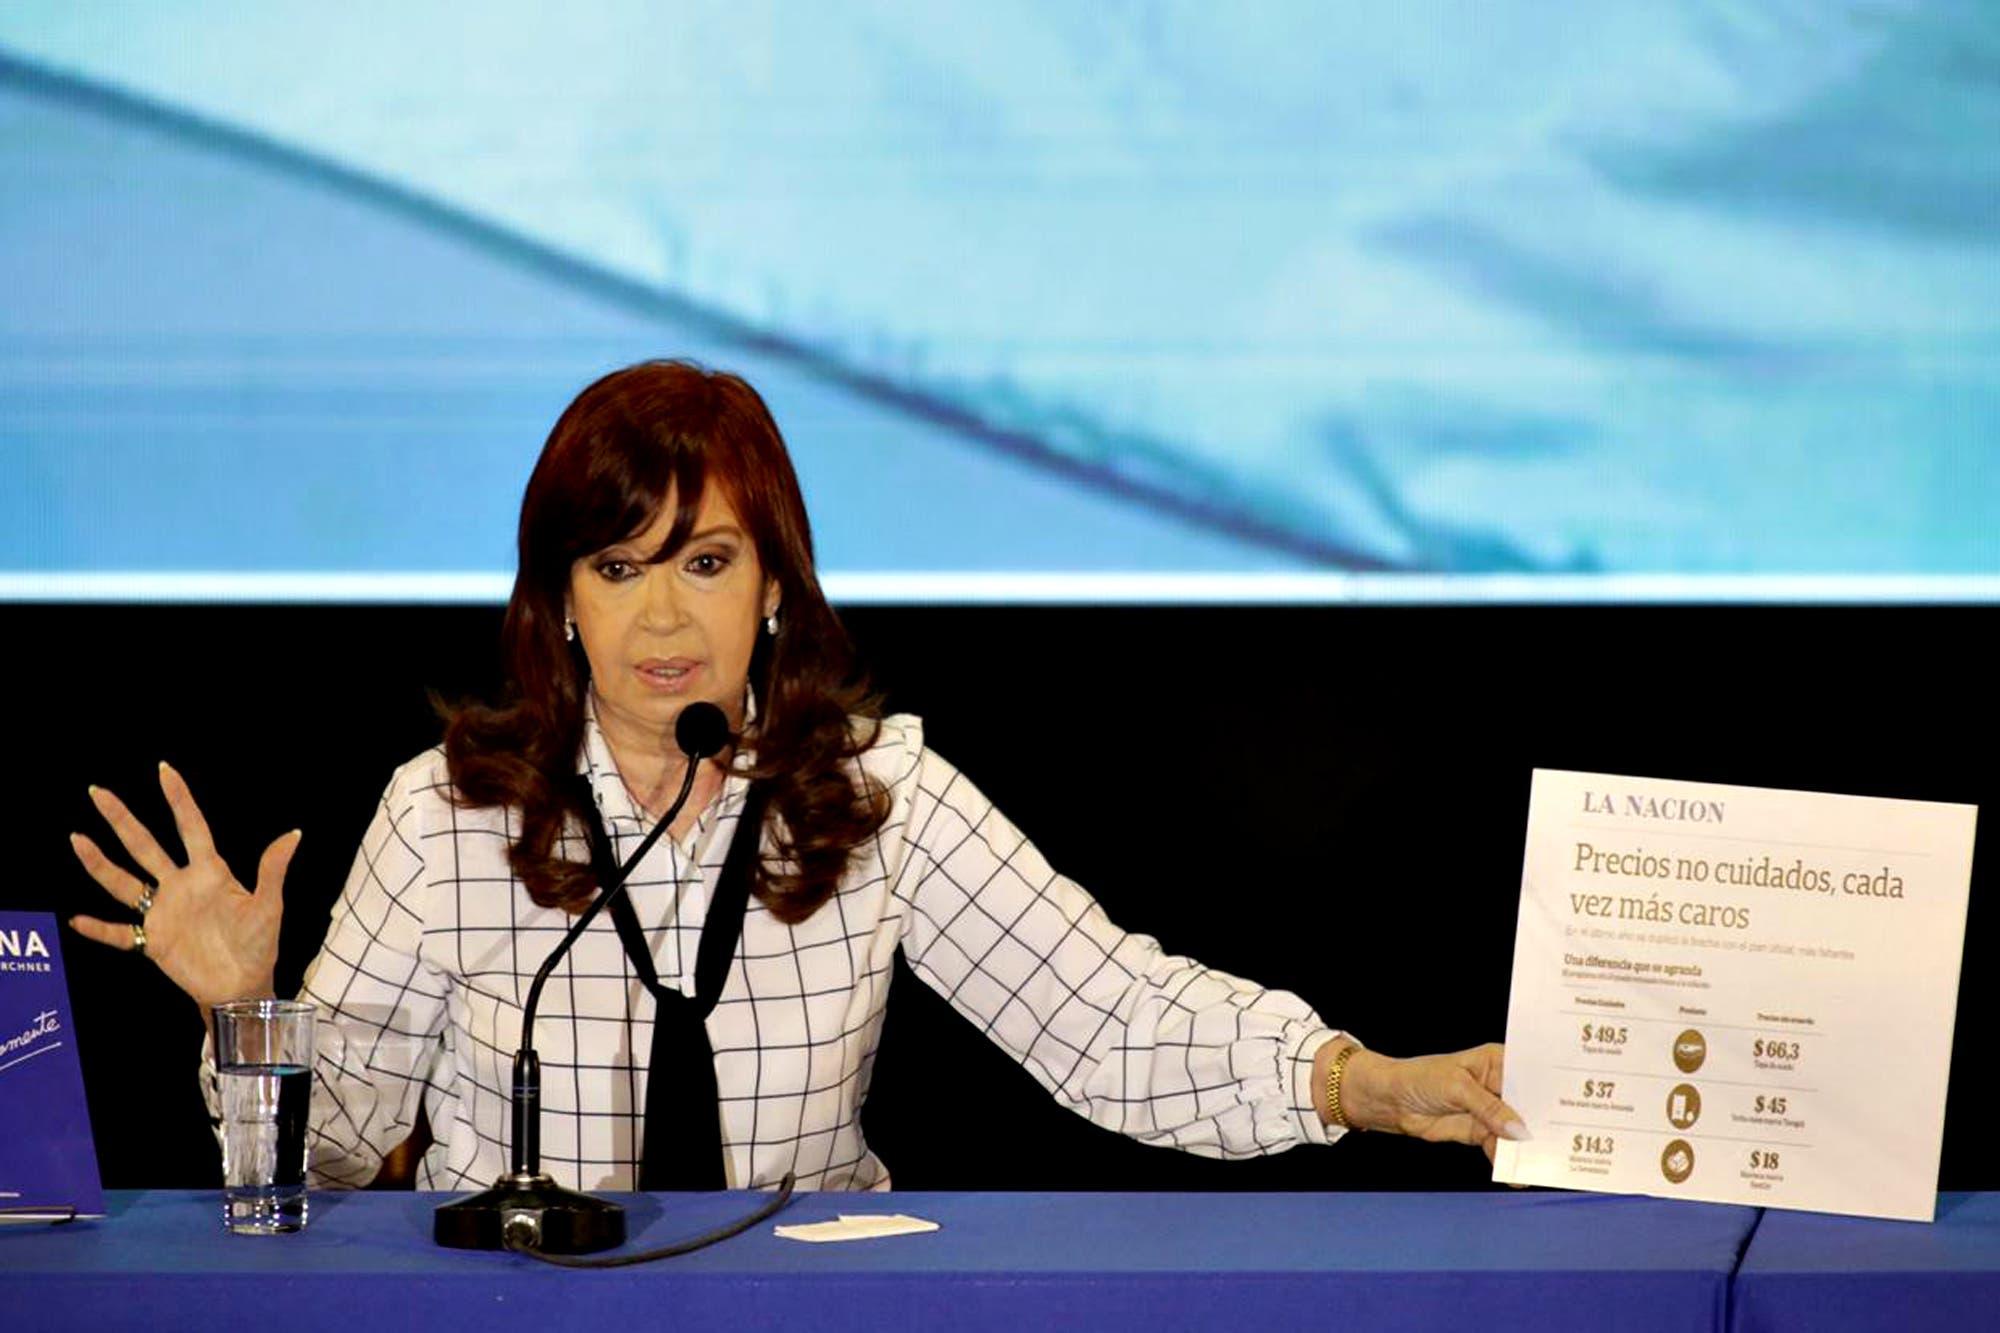 Precios Esenciales. El error de Cristina Kirchner sobre la cobertura de LA NACION